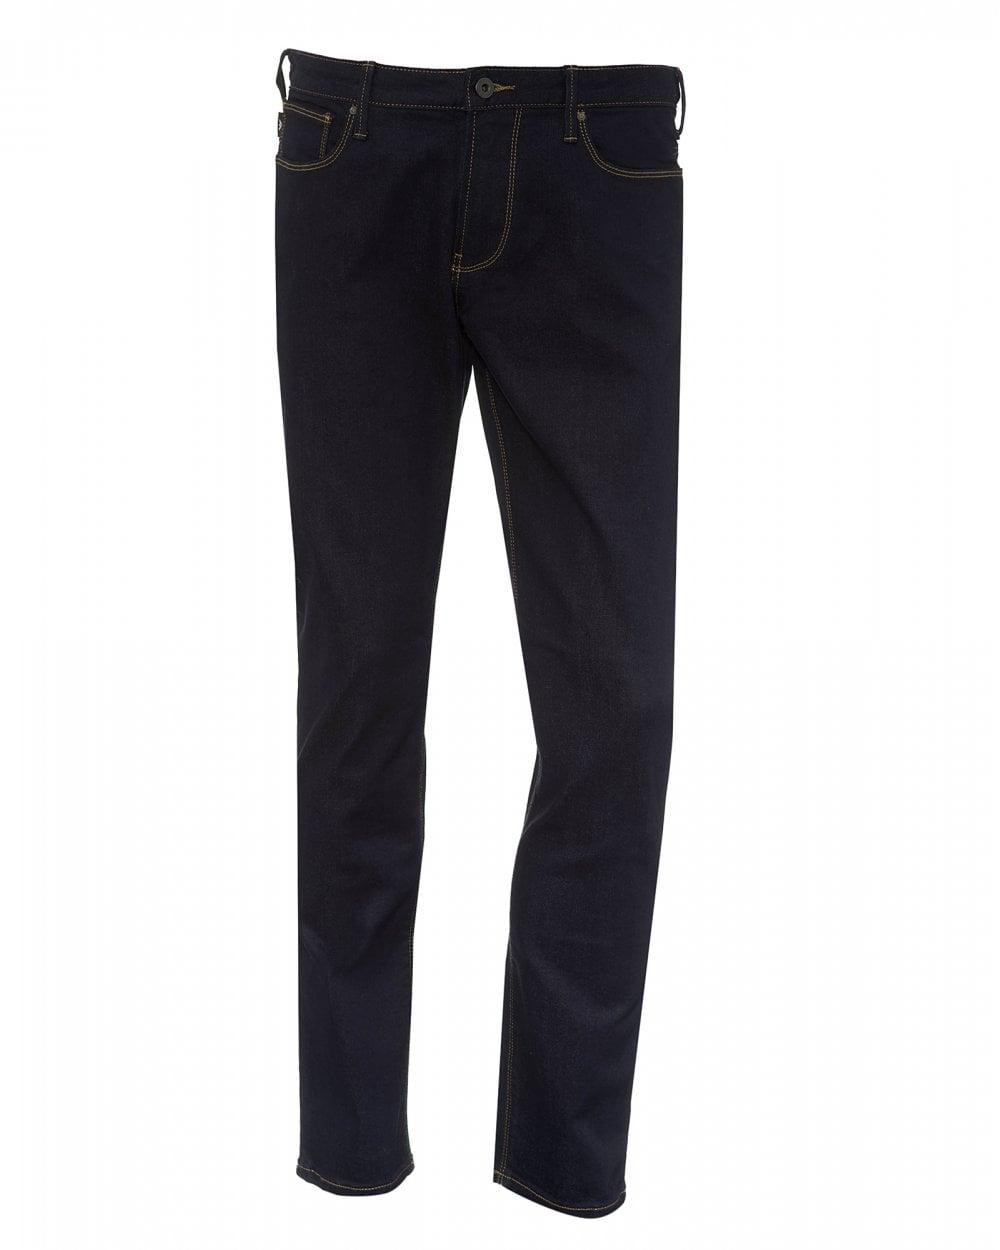 46645b8ee8e69 Emporio Armani Mens J06 Slim Dark Indigo Jeans